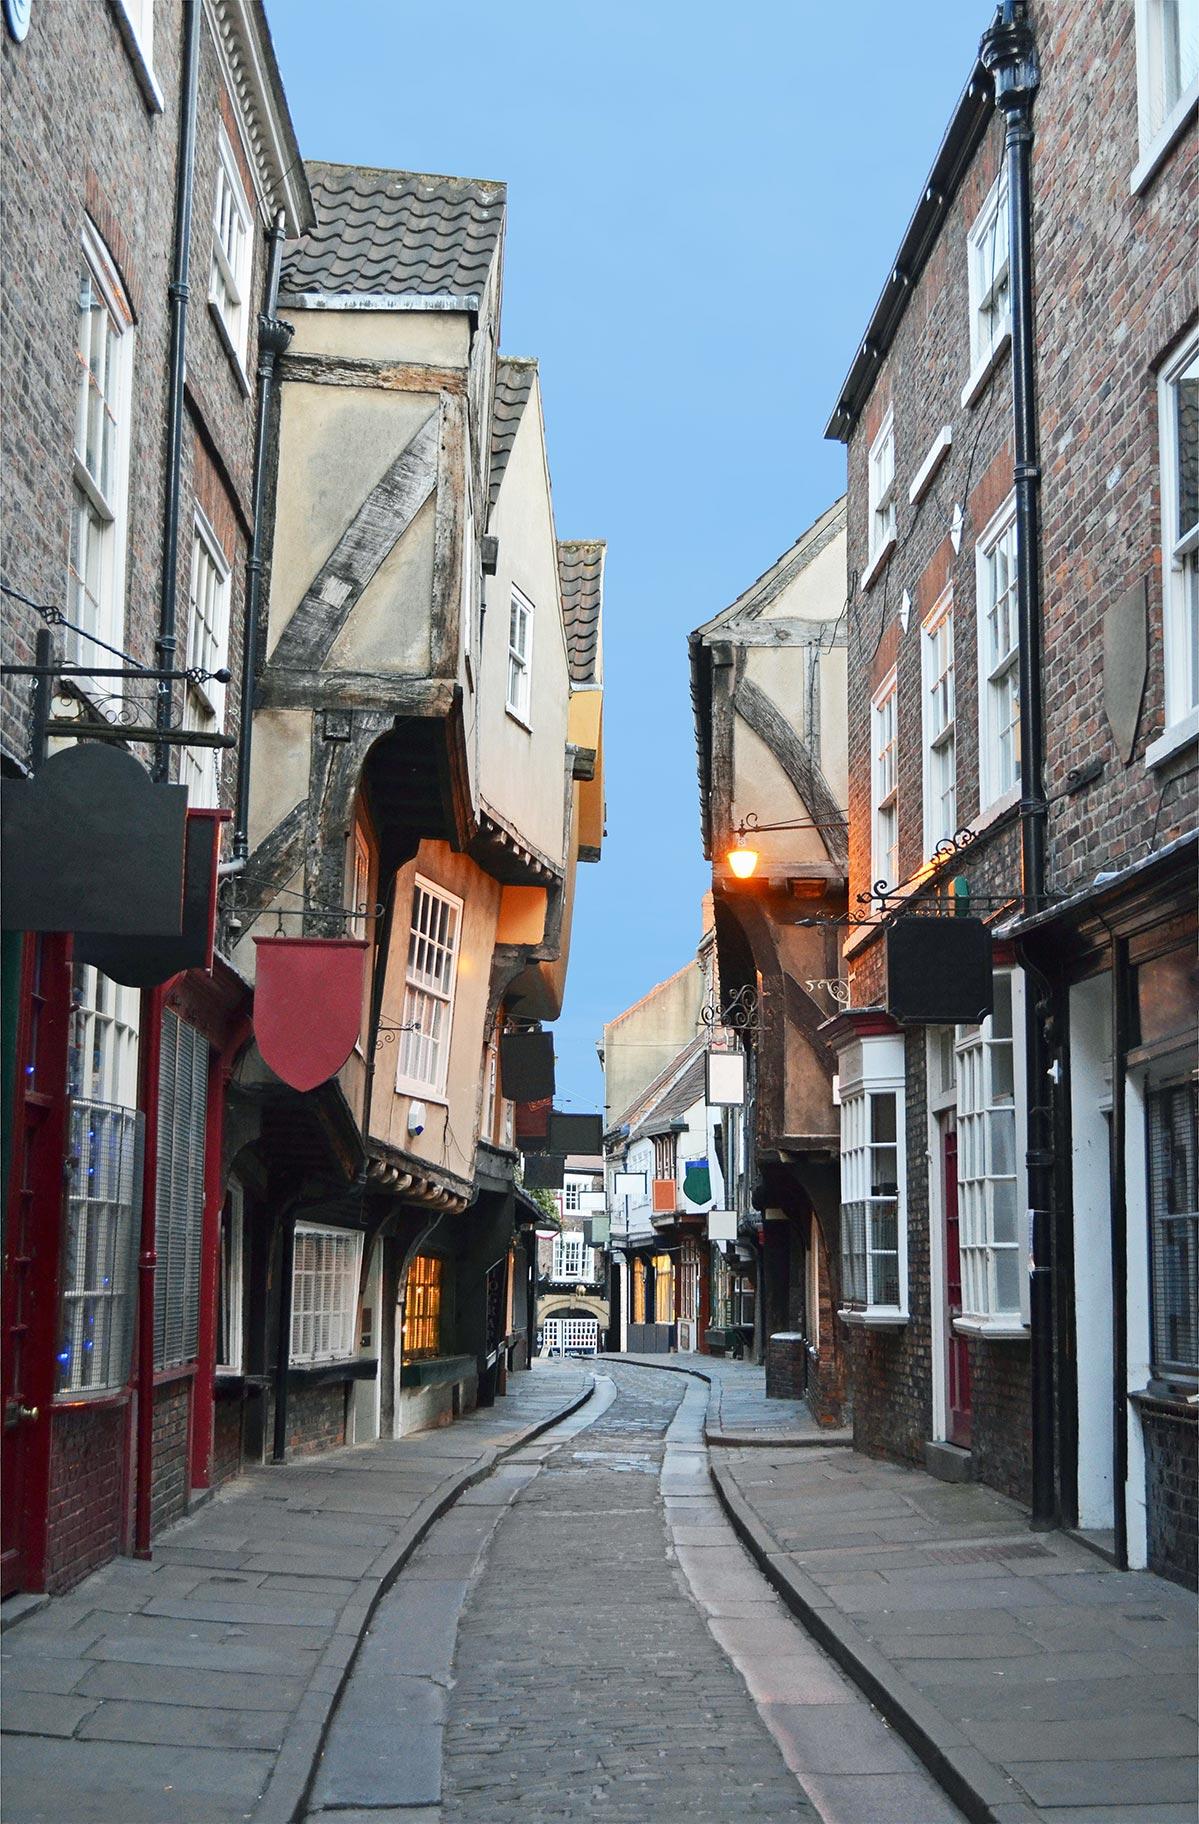 shutterstock-York-1